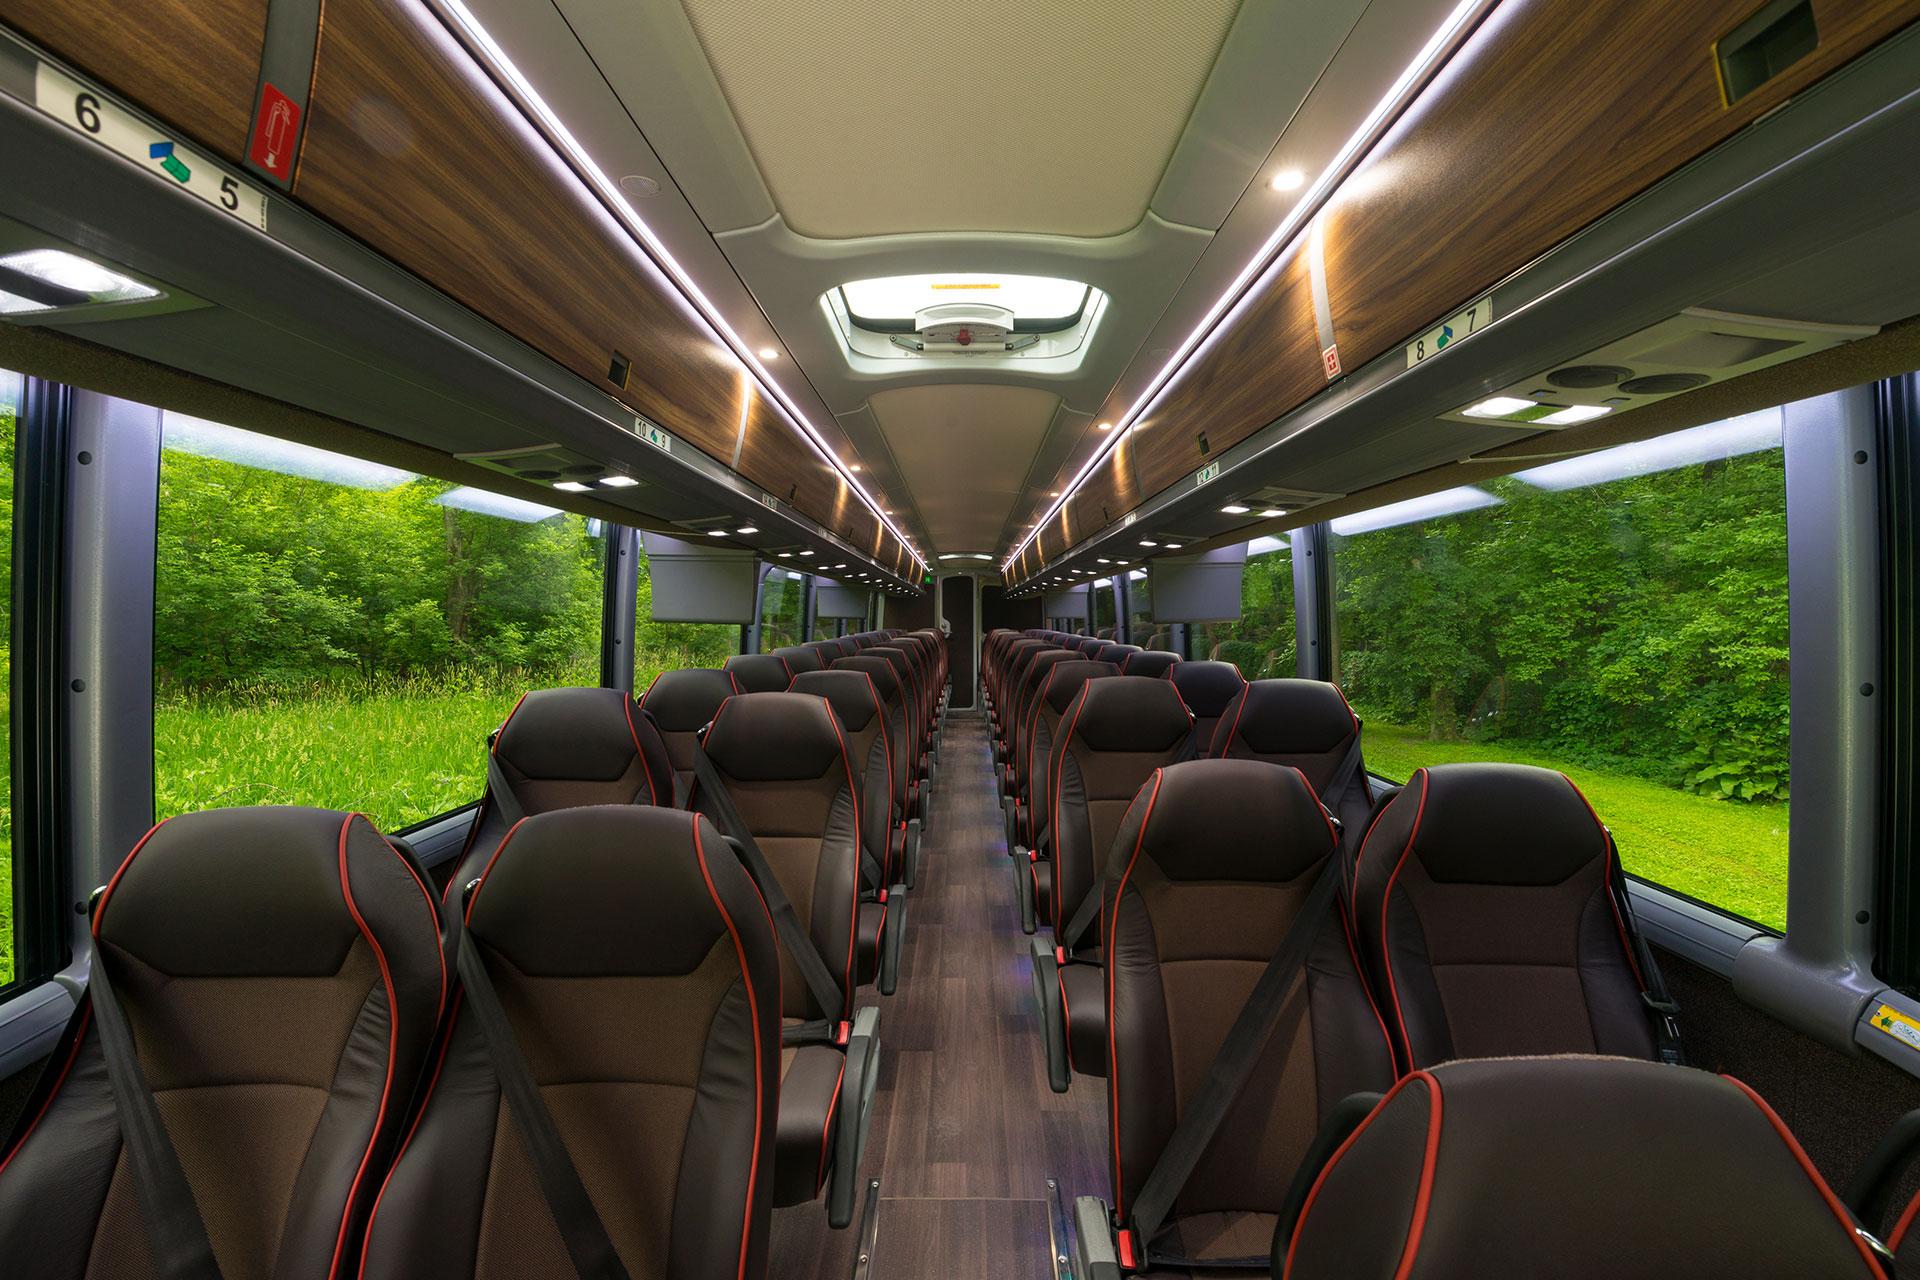 Kansas City Charter Bus - Arrow Stage Lines